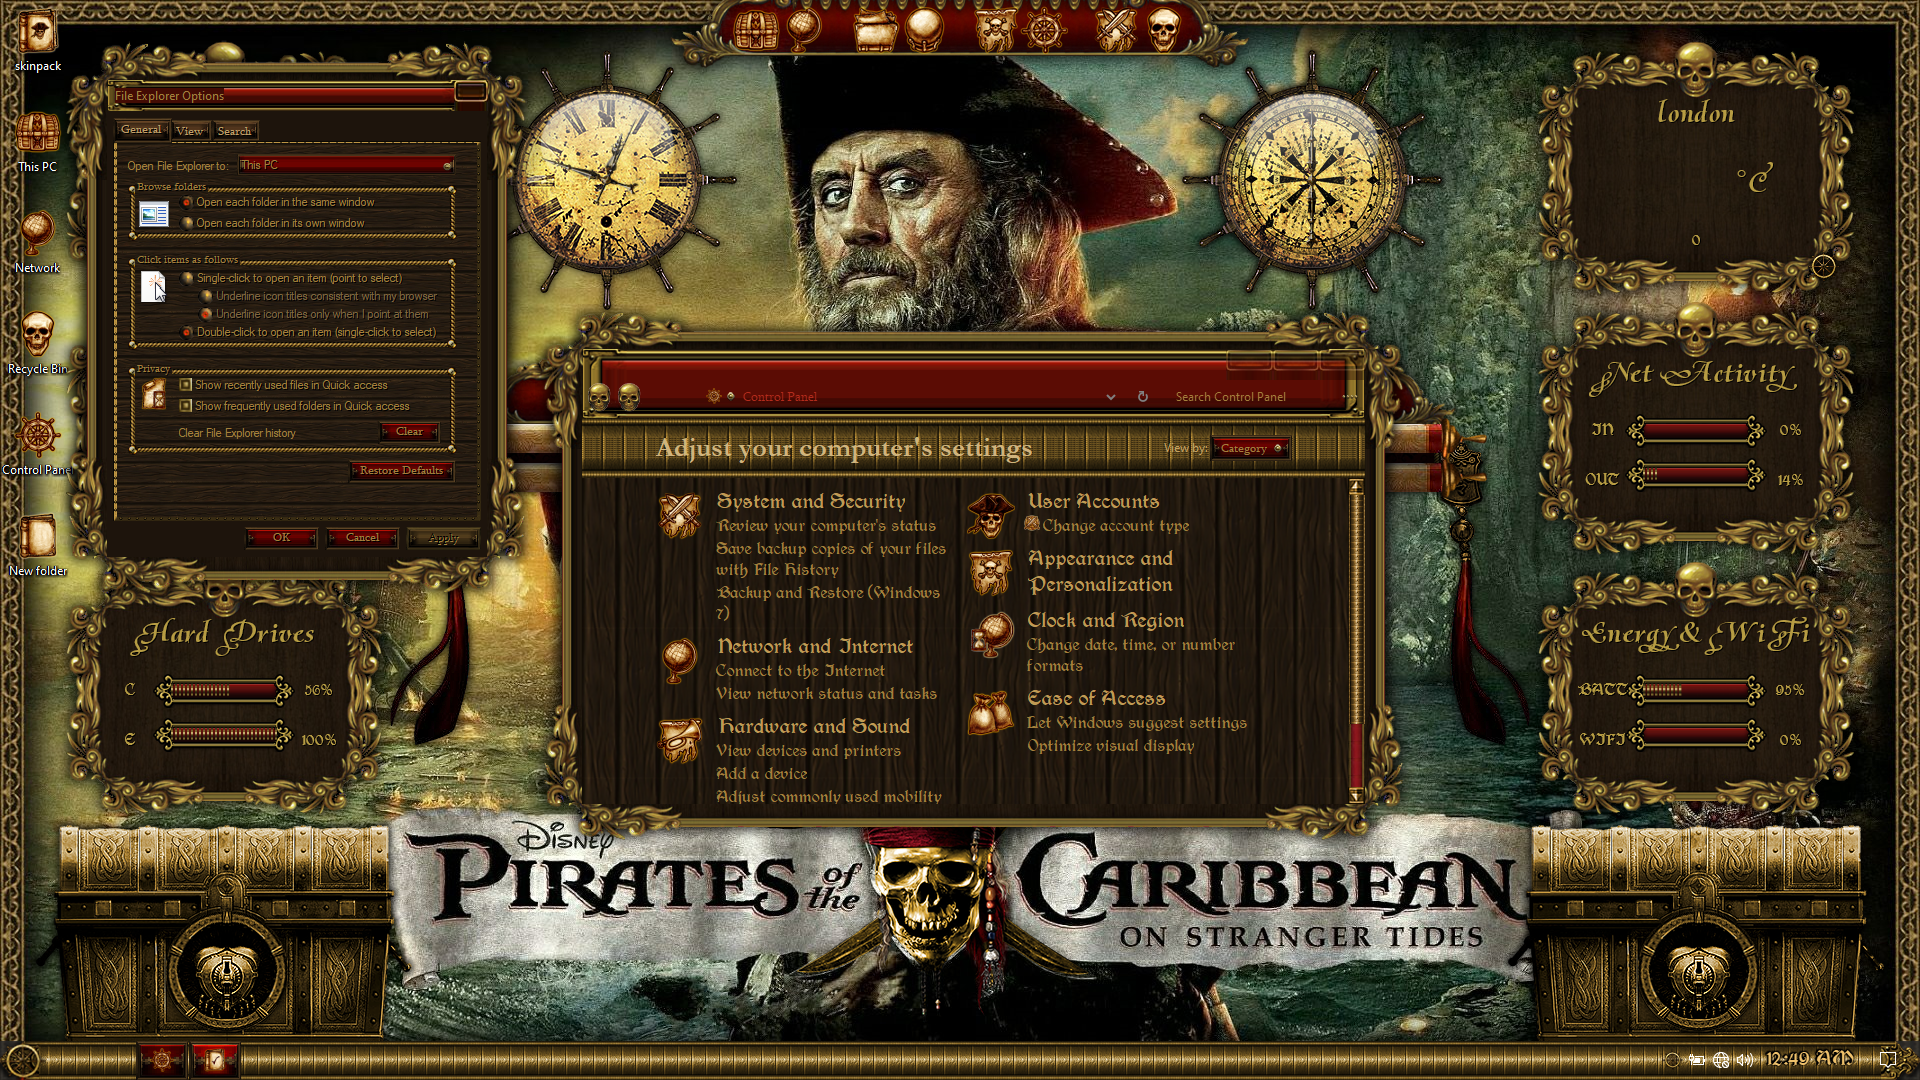 Pirates of the Caribbean Premium SkinPack for Windows 10